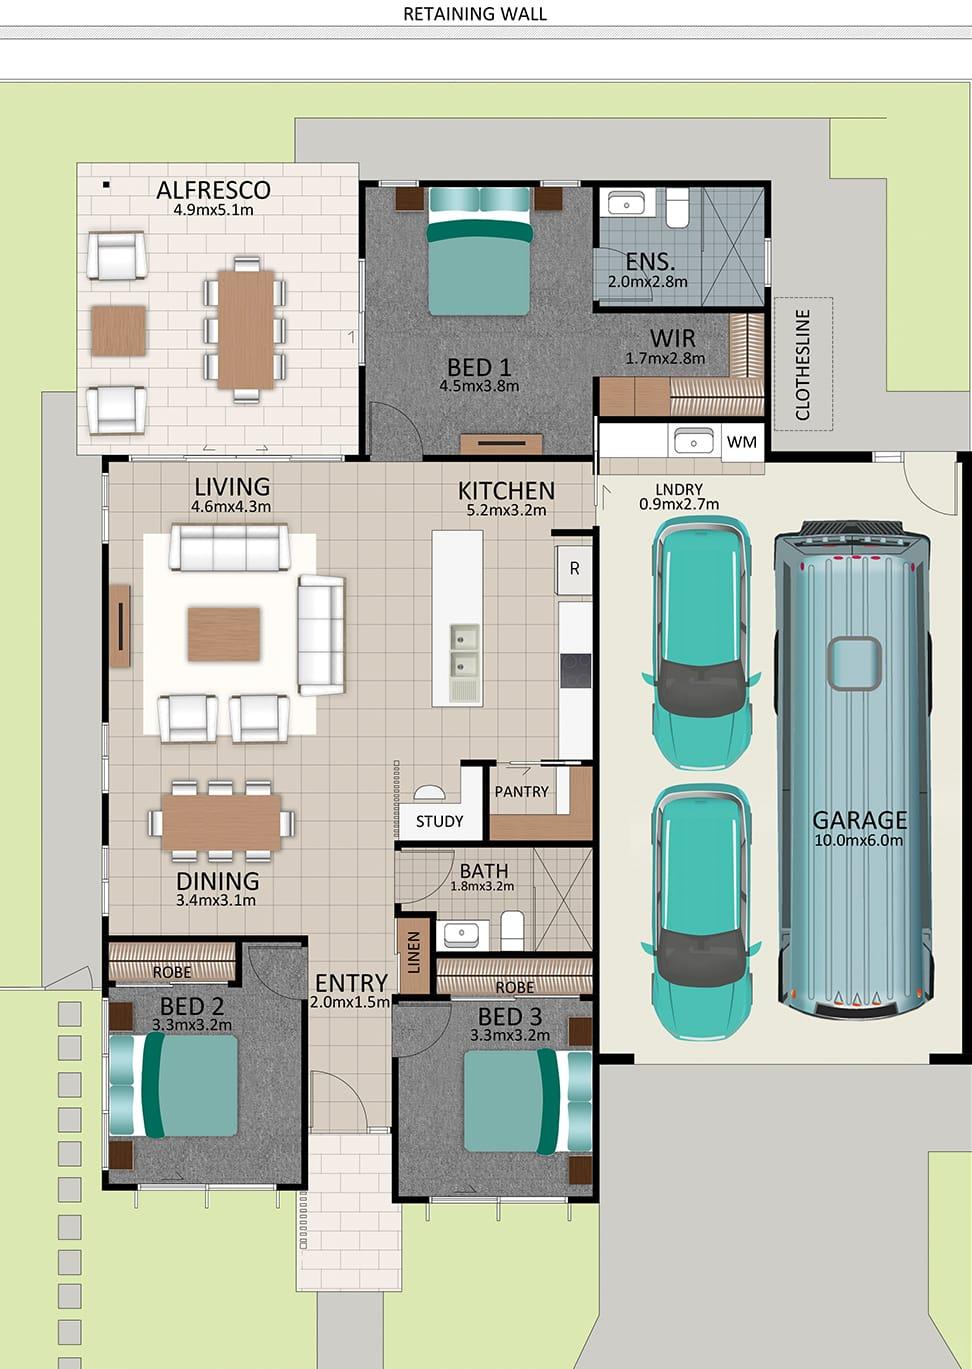 LAT25 Floorplan GAL OCT20 LOT 213 - Lot 213